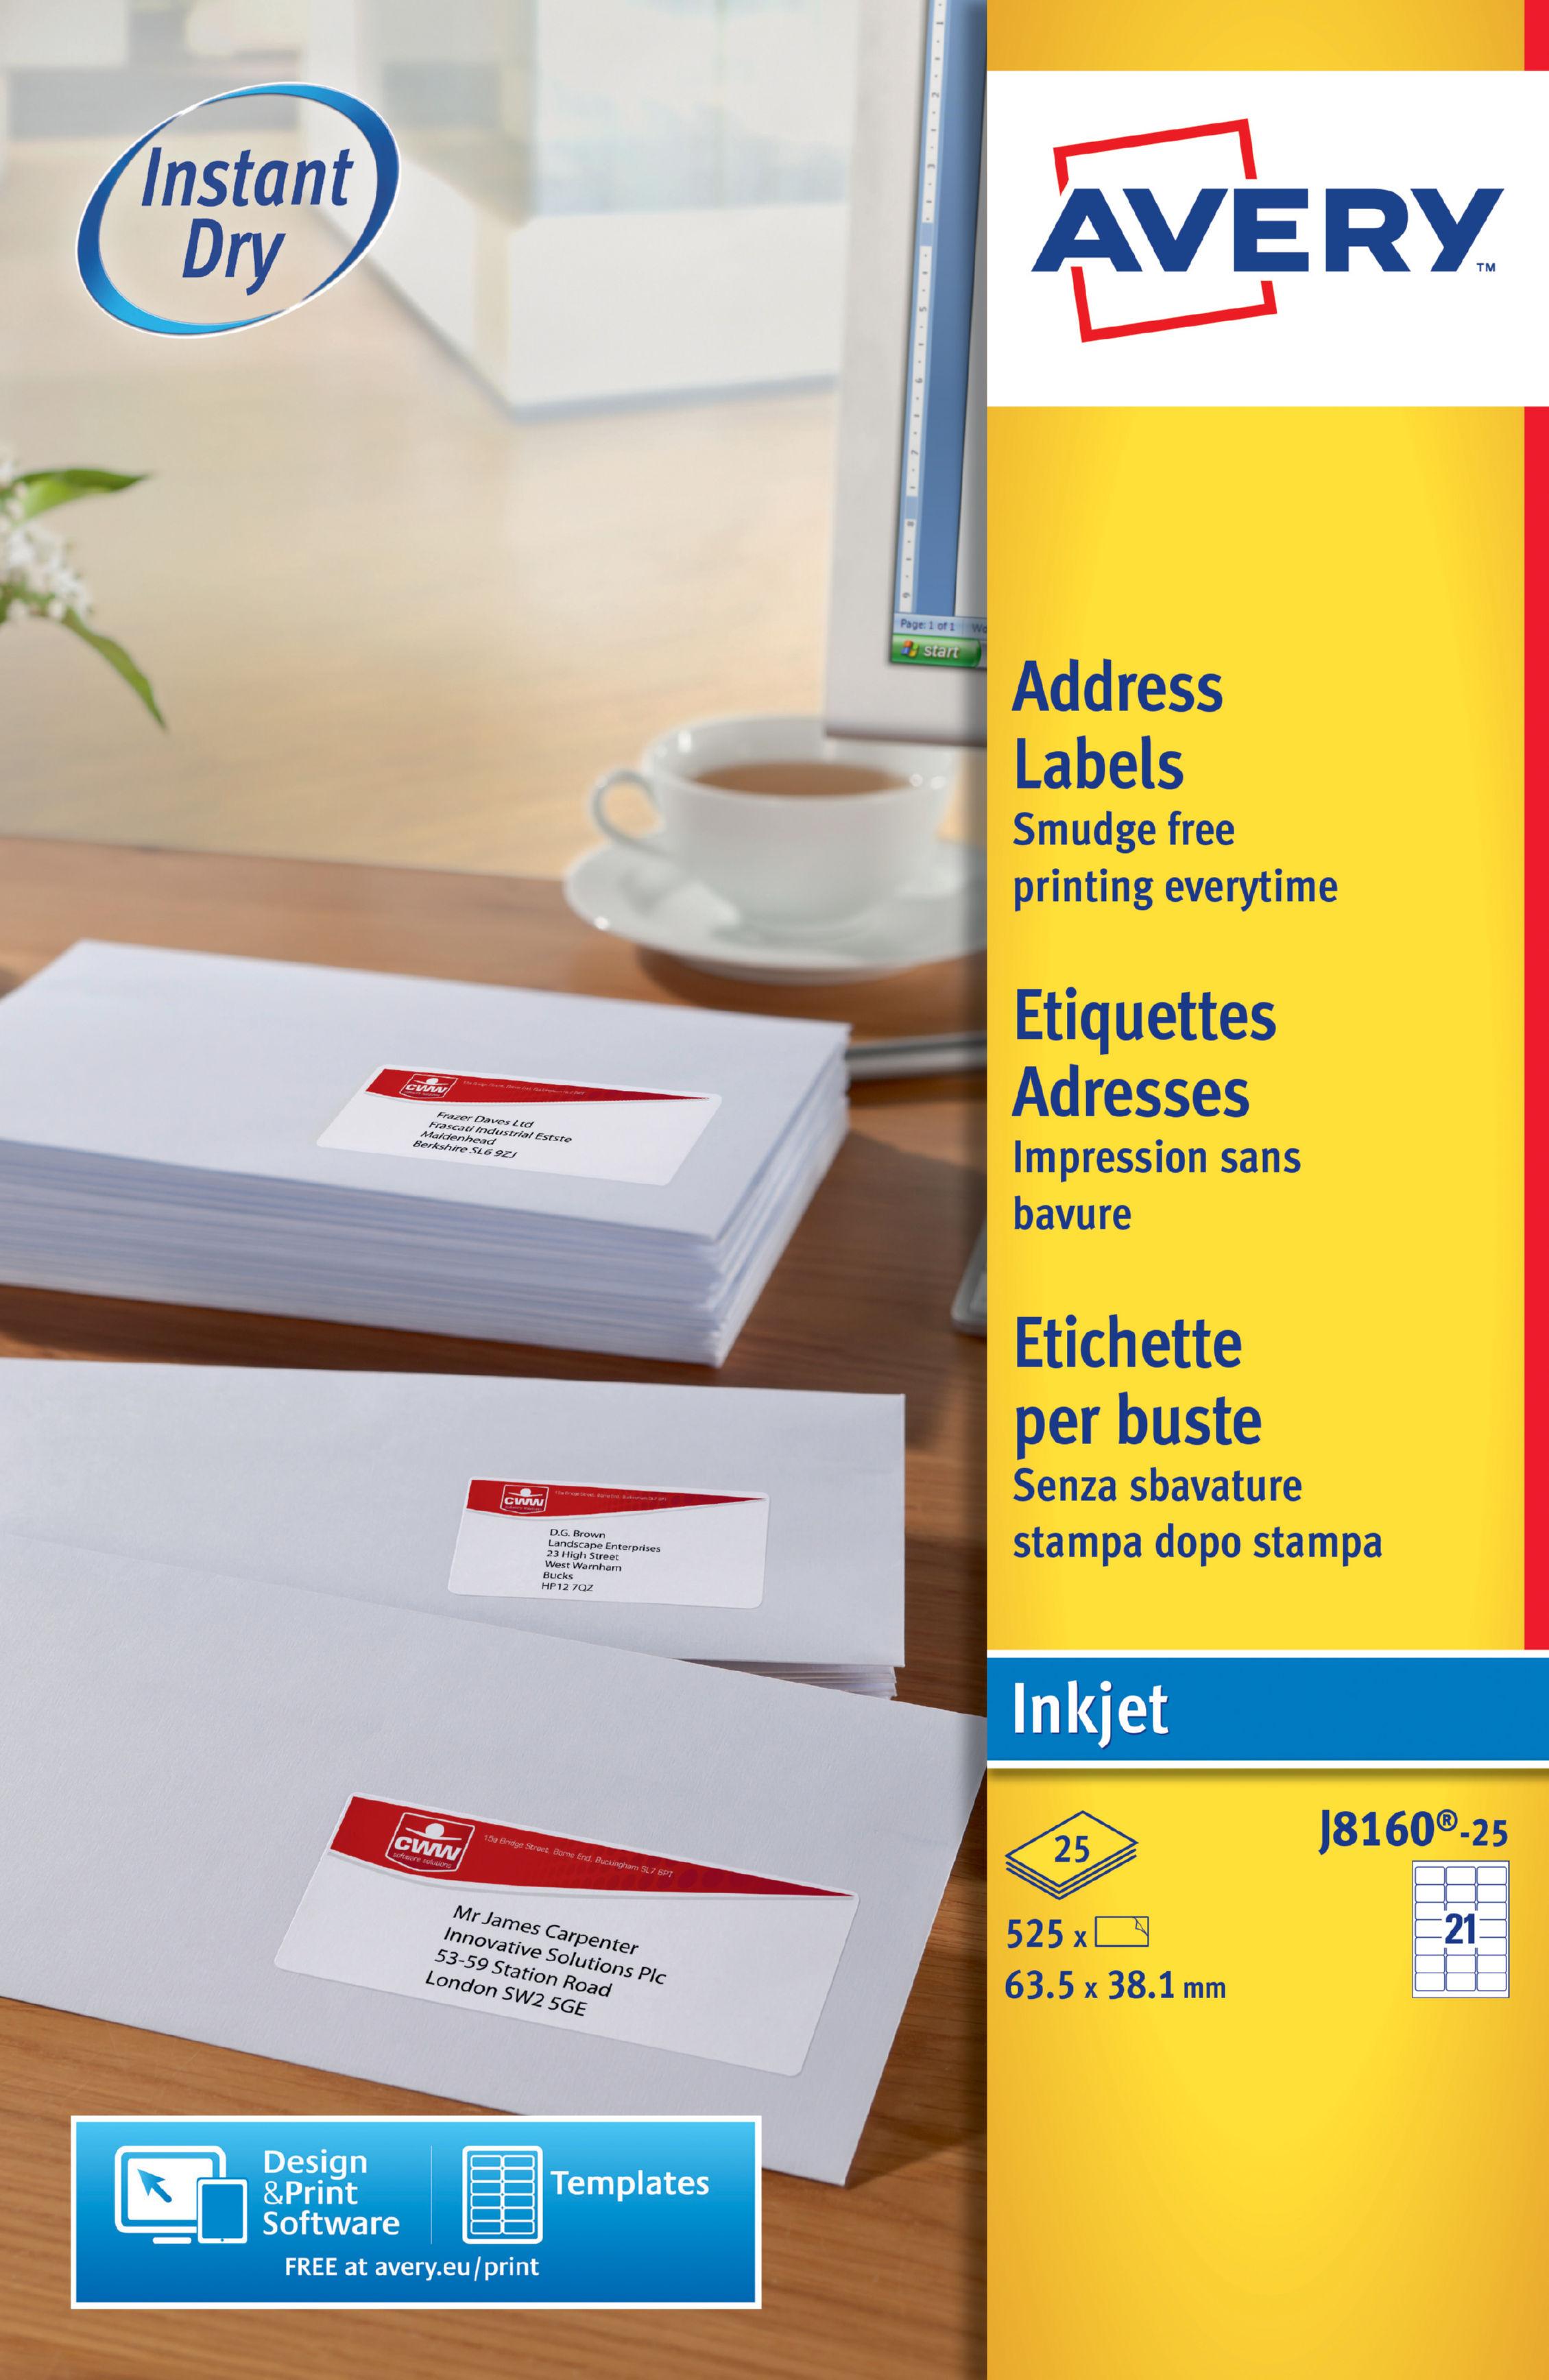 avery inkjet address labels 63 5x38 1mm j8160 25 525labels